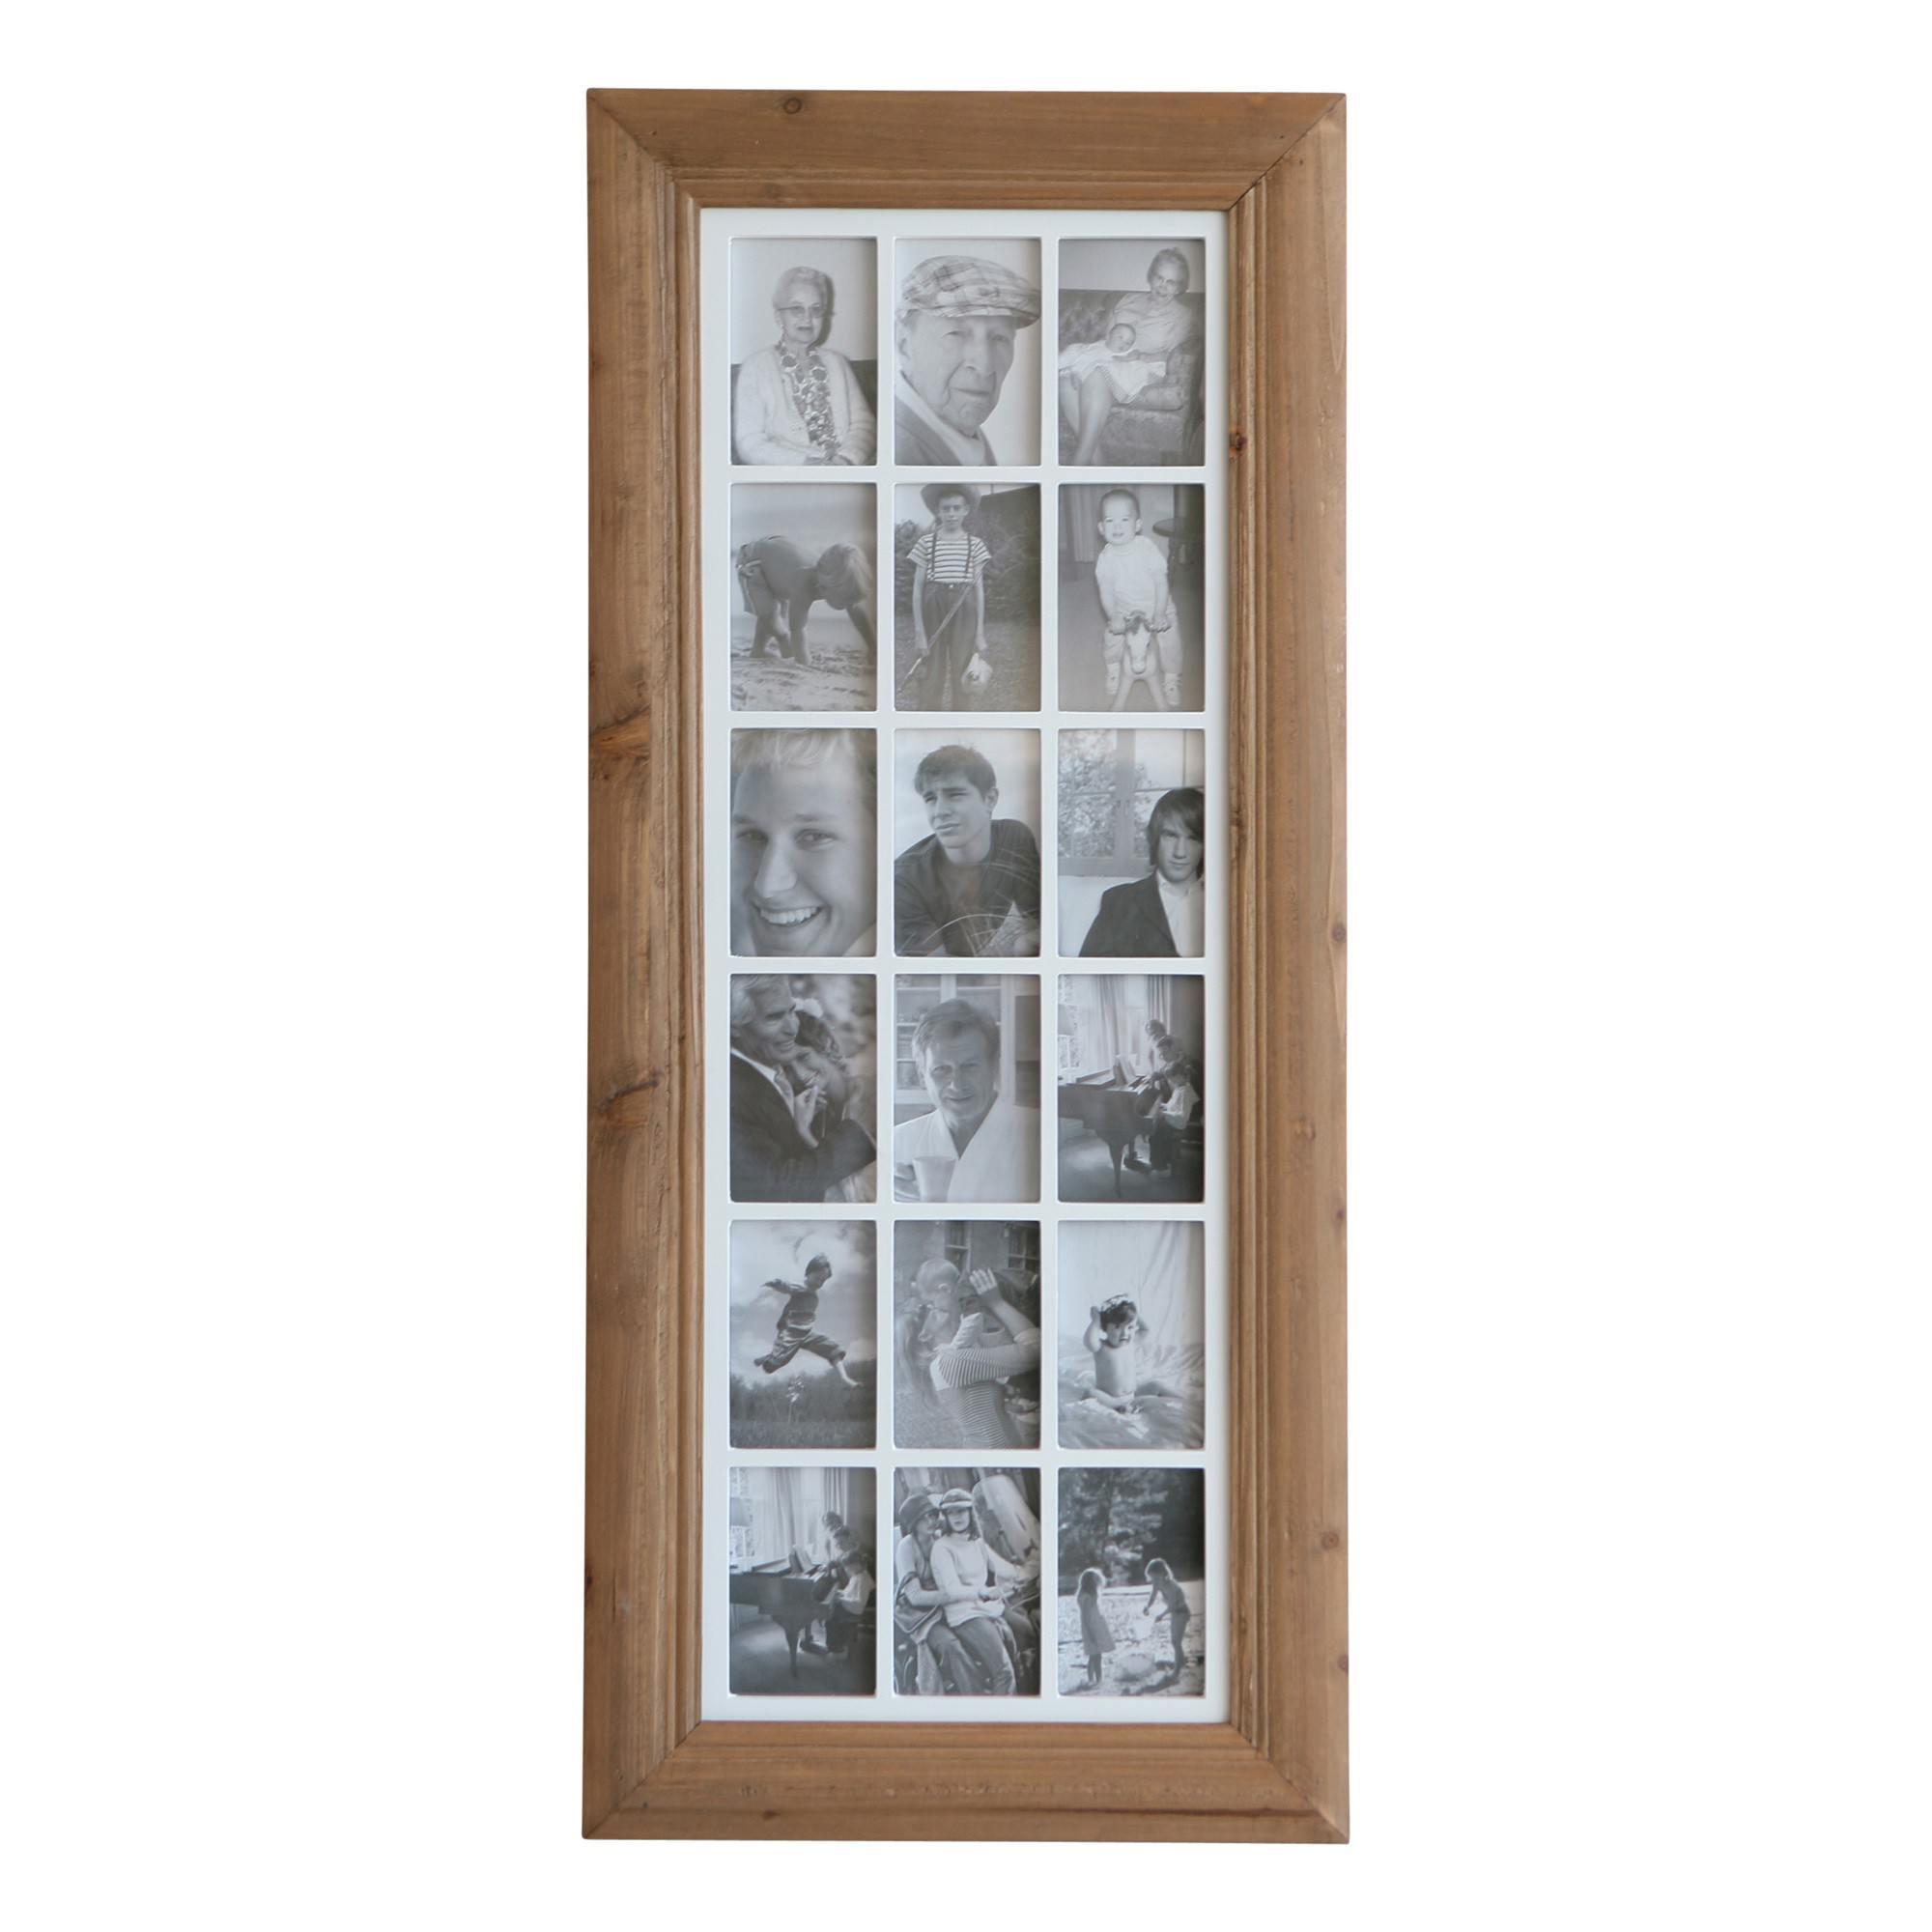 "Lester Photo Collage Frame, 18 Photos, 4x6"", Natural"